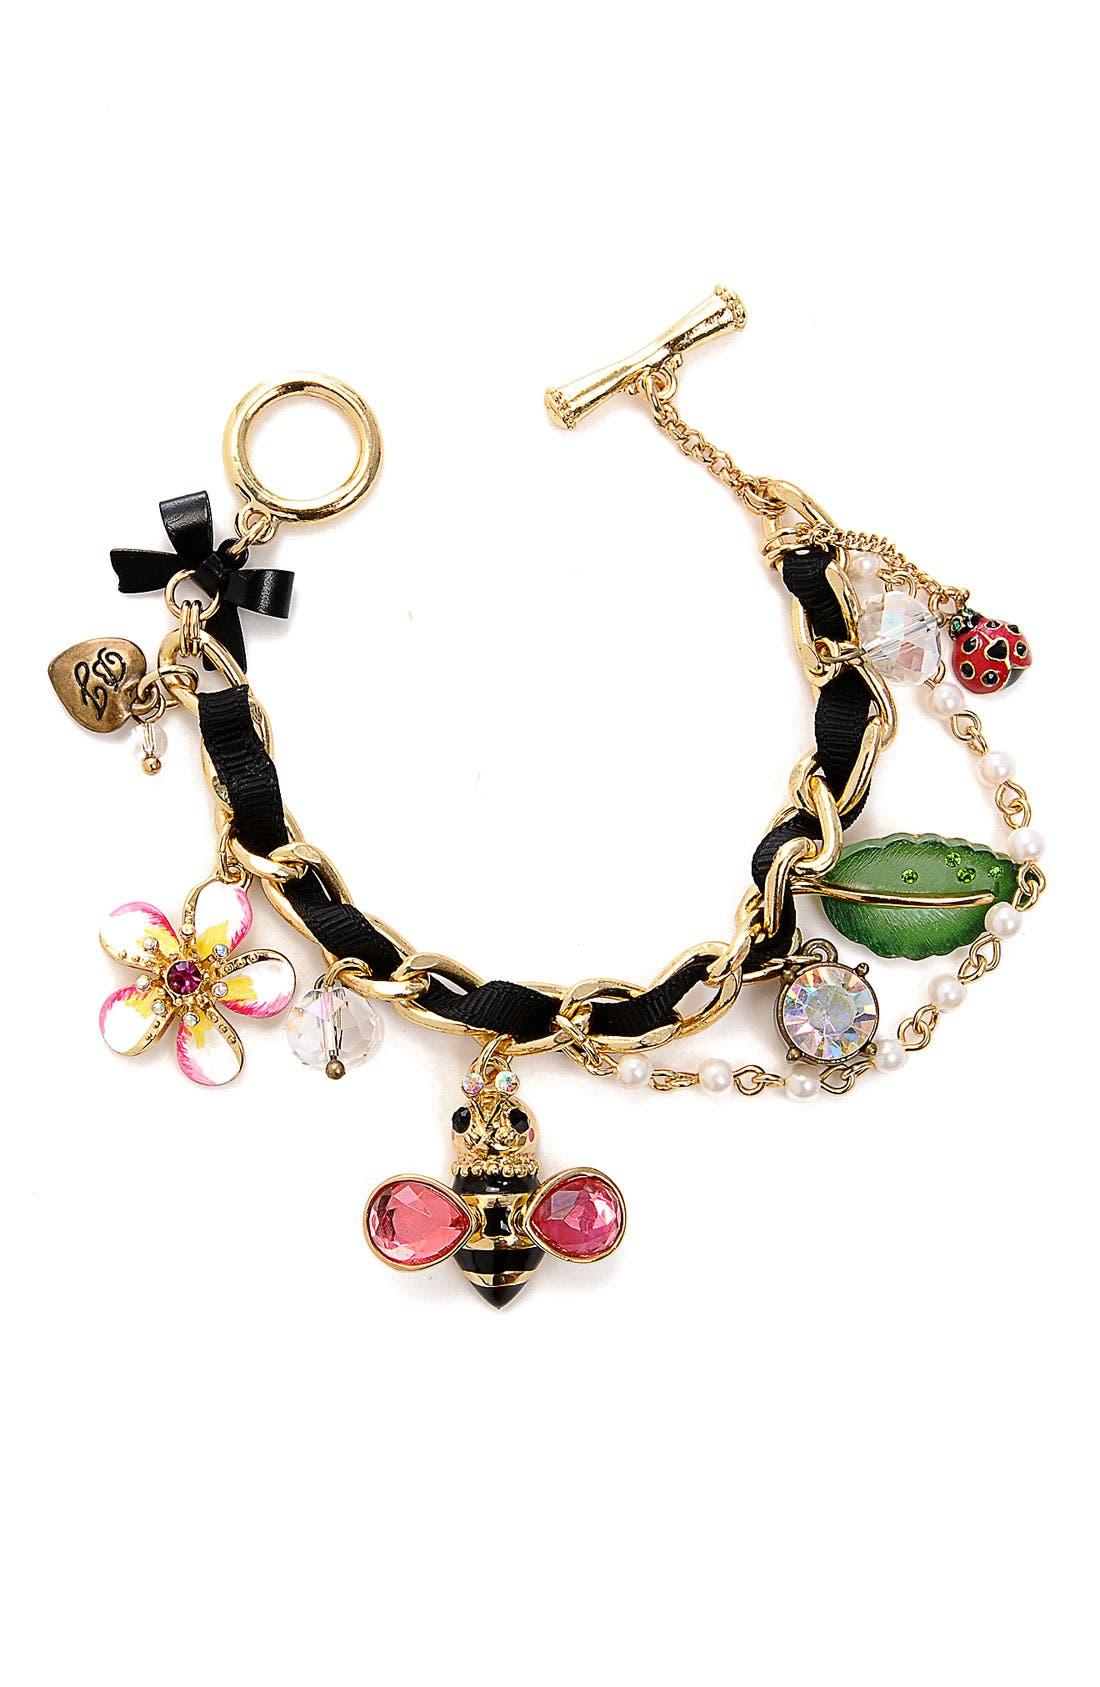 Alternate Image 1 Selected - Betsey Johnson 'Hawaiian Luau' Bumblebee Charm Bracelet